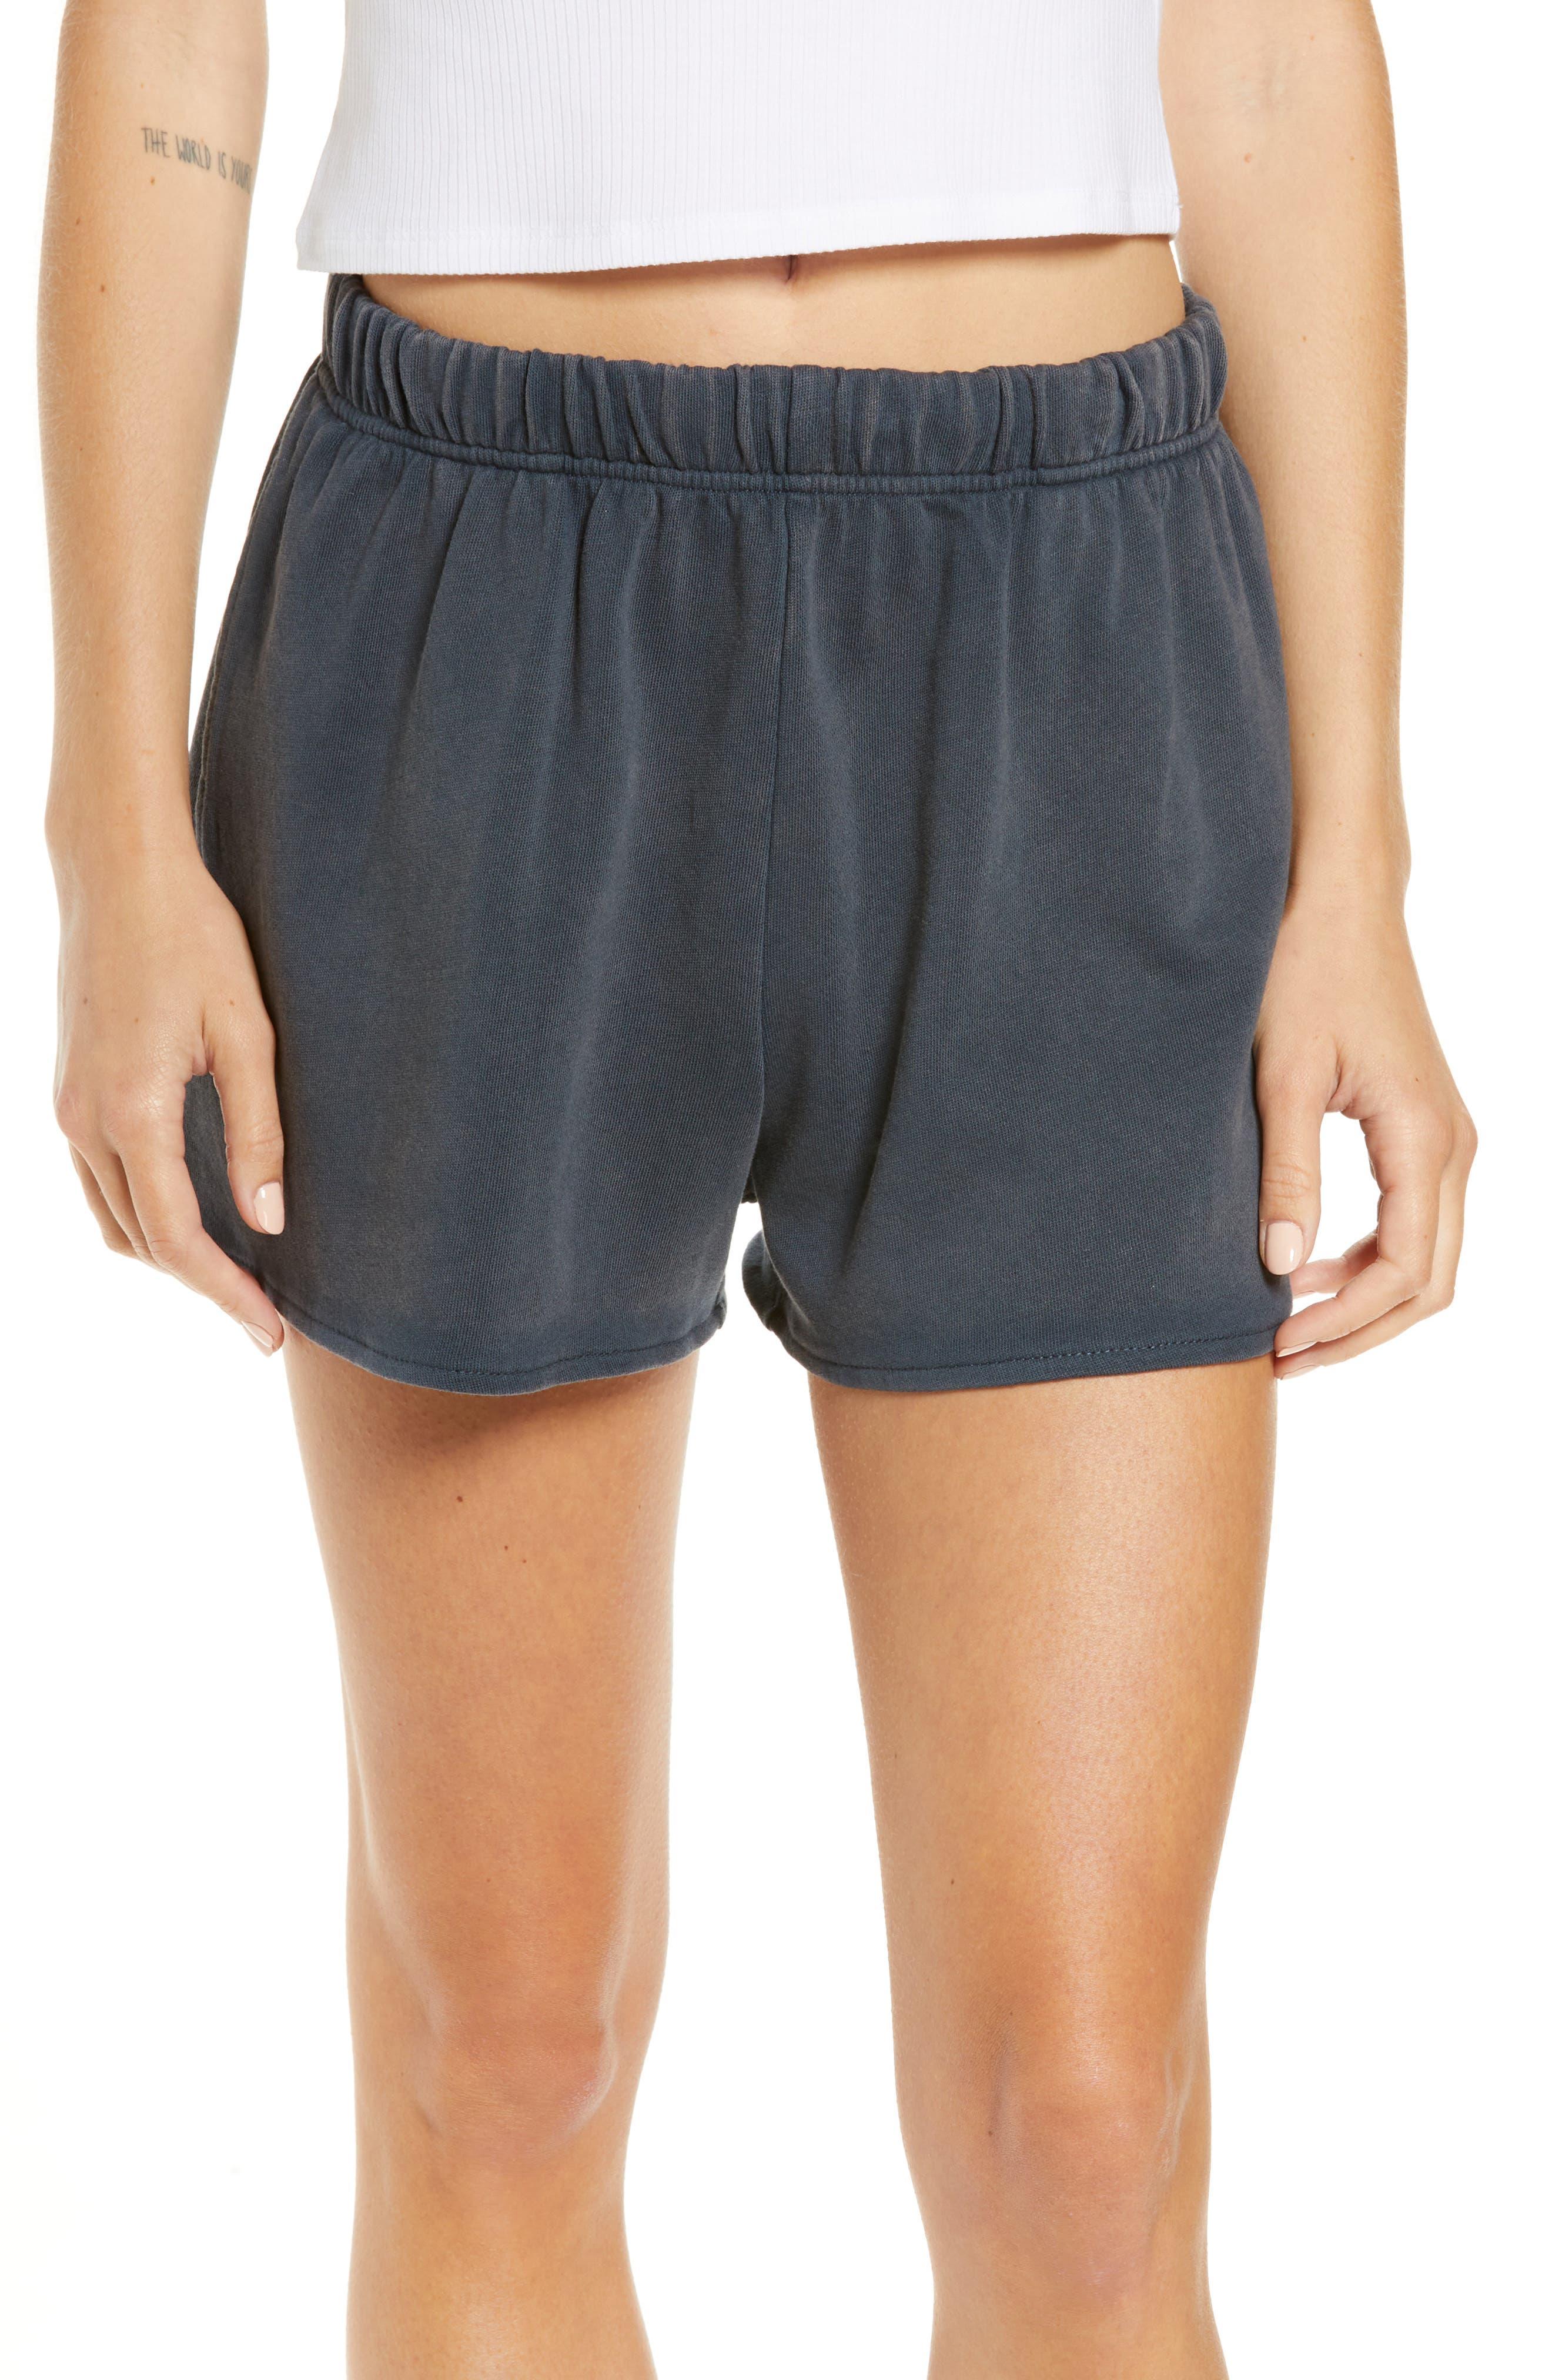 Beach Bum Lounge Shorts